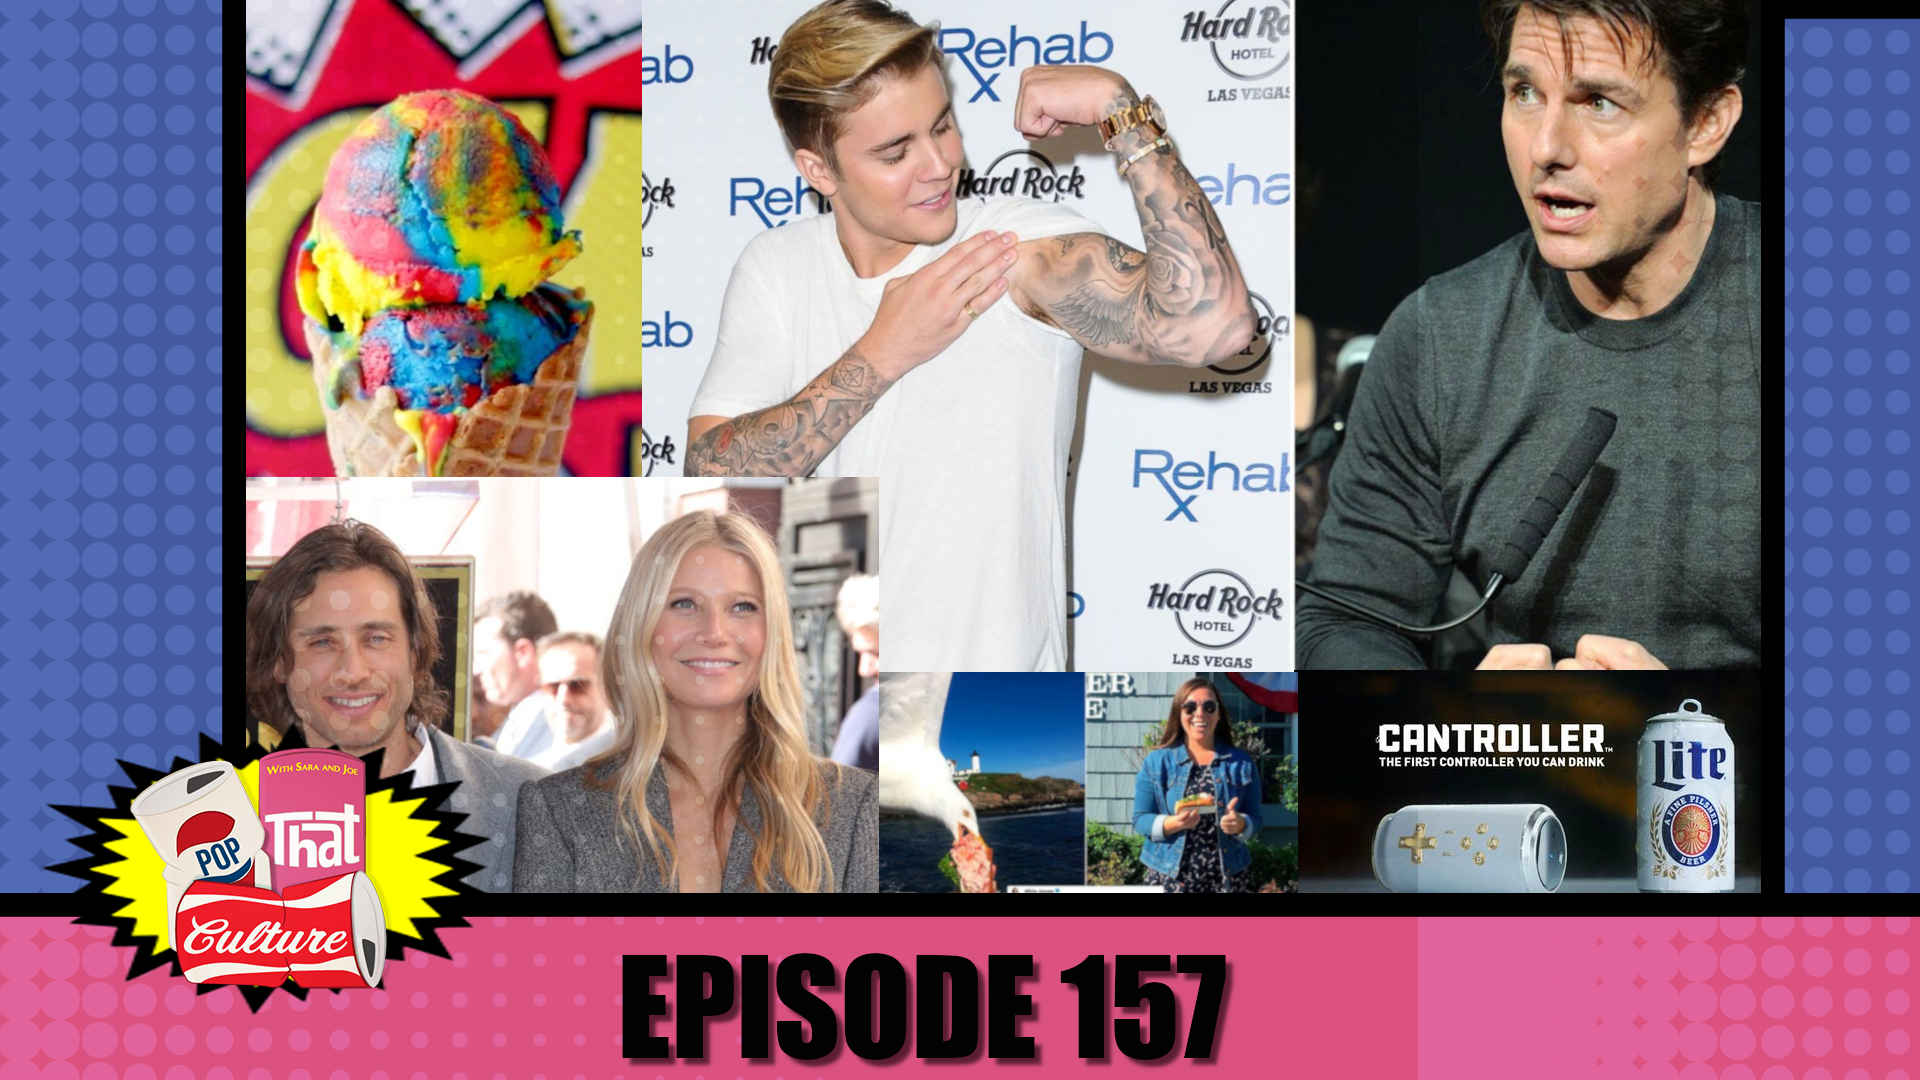 Pop That Culture - Episode 157